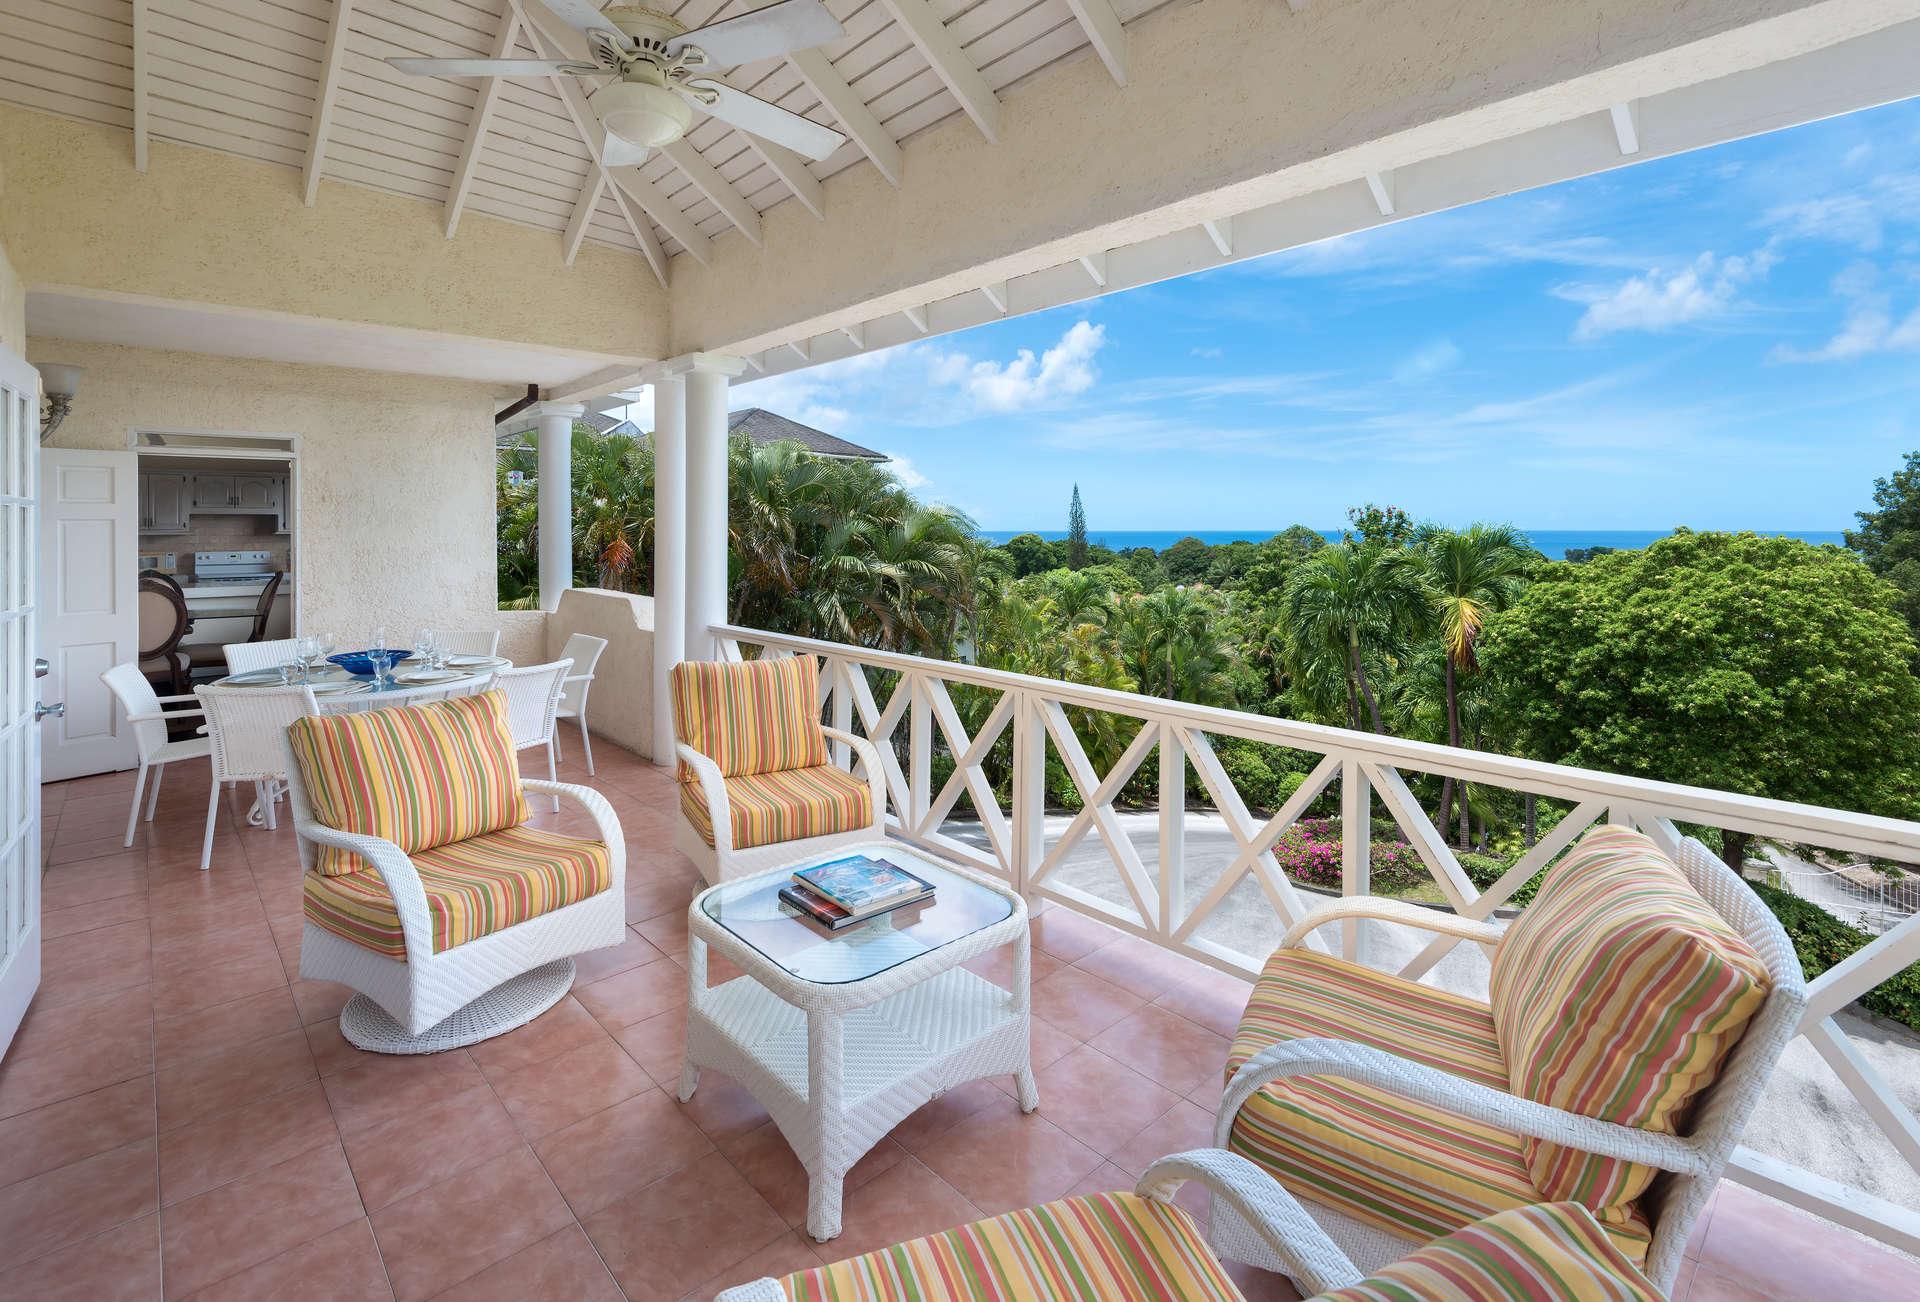 Luxury villa rentals caribbean - Barbados - St james - Holetown st james - Belle View - Image 1/13